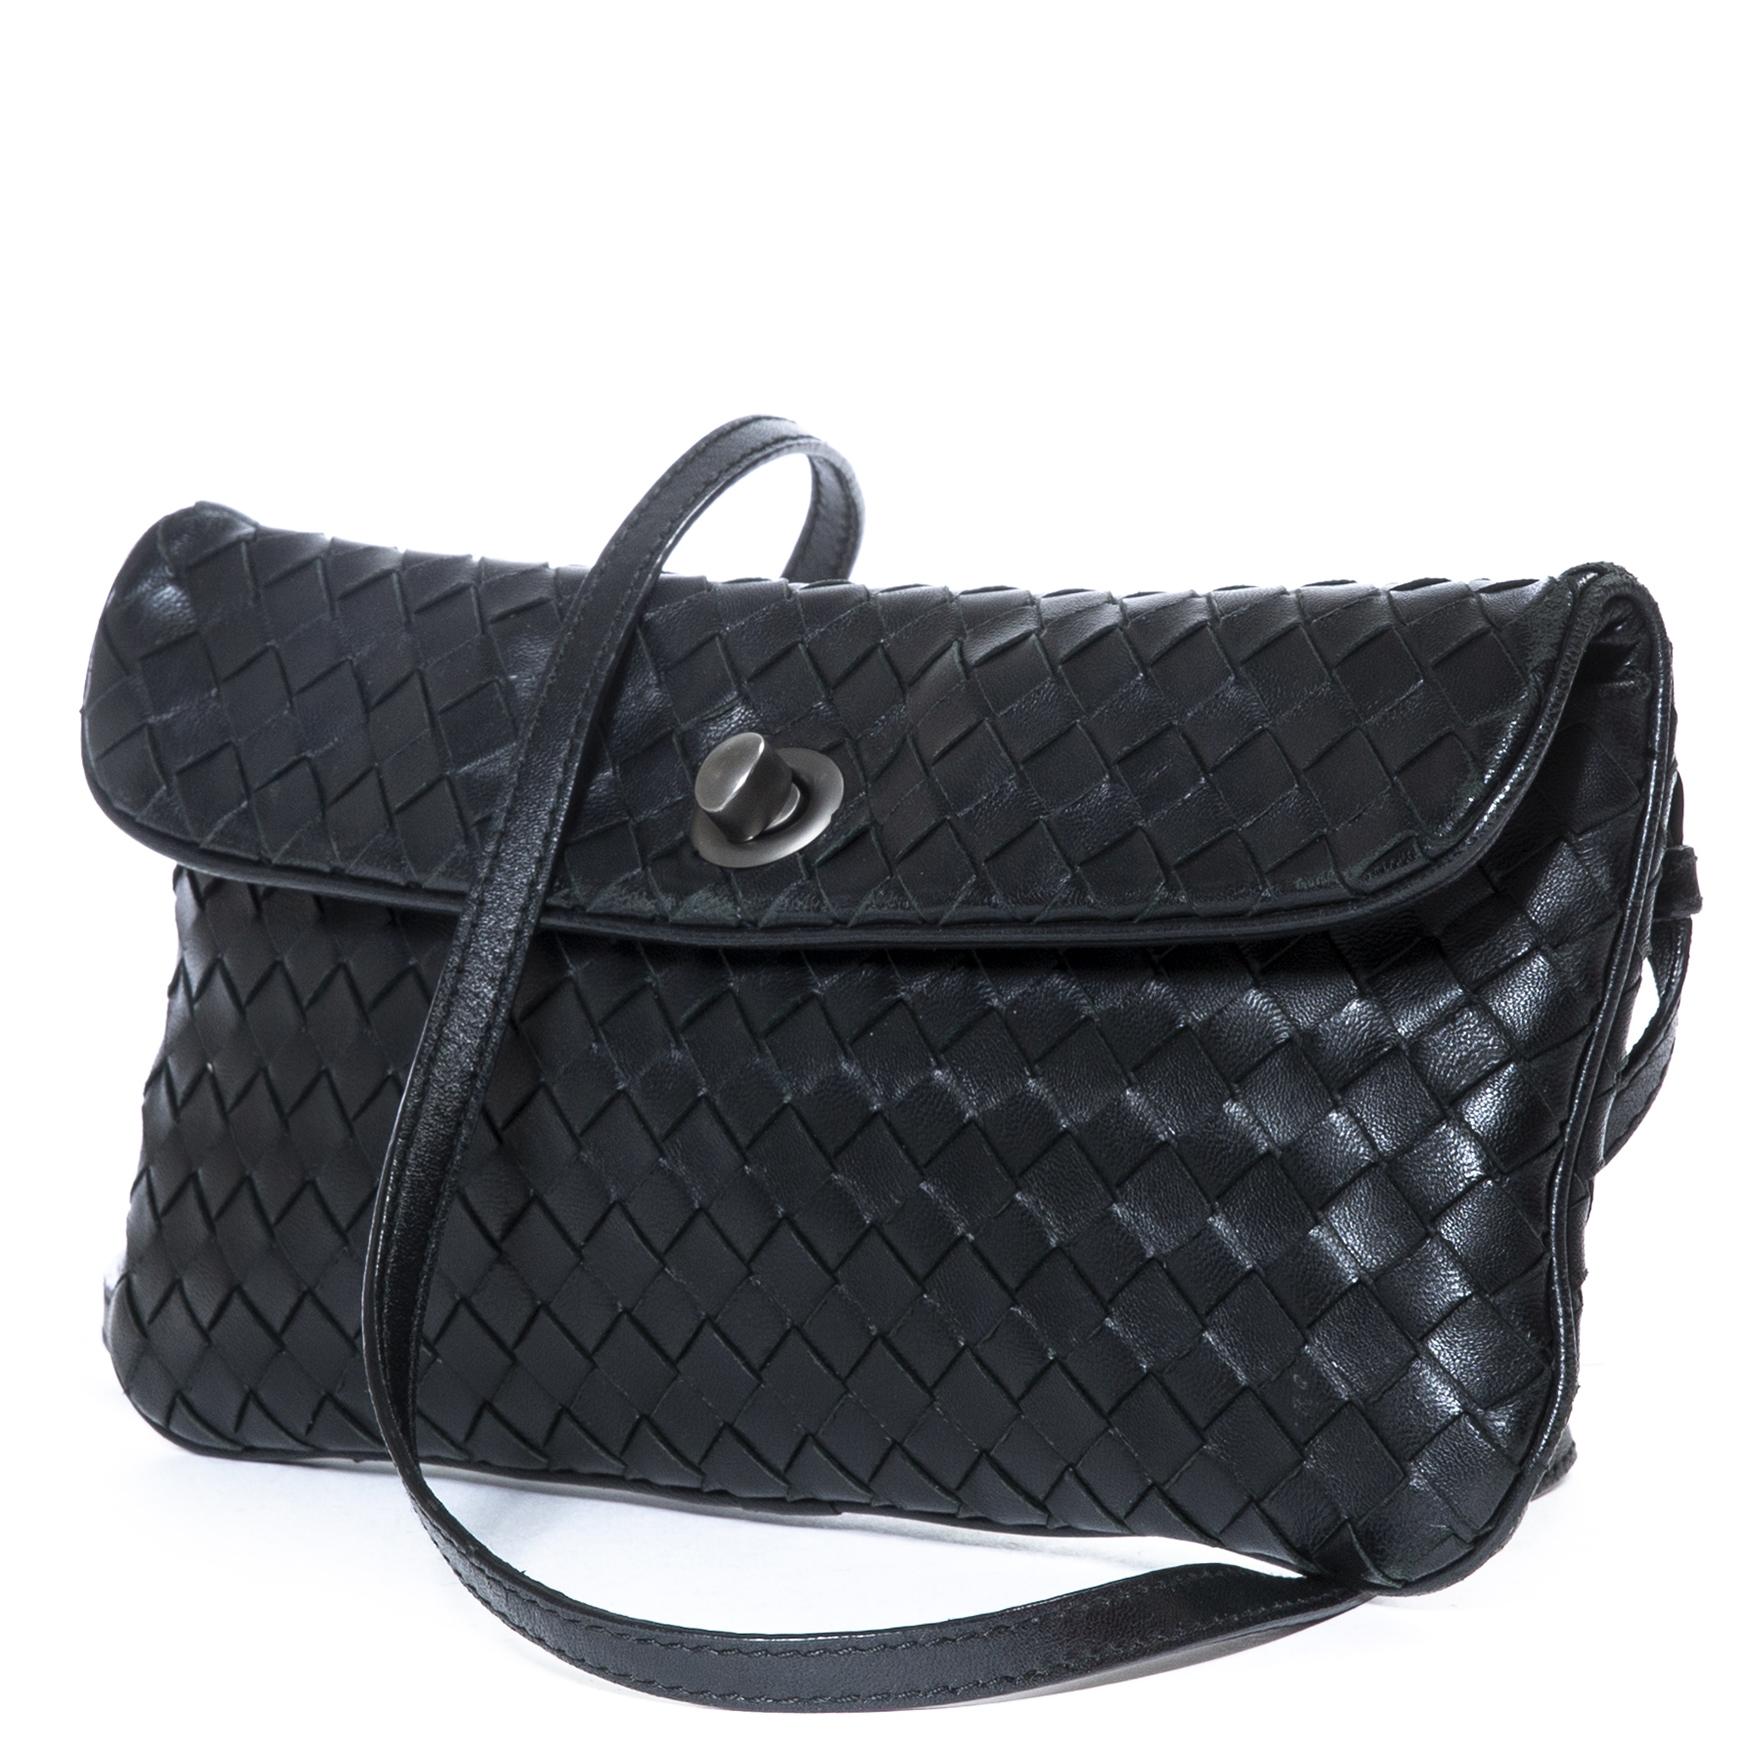 ... Labellov Bottega Veneta Small Black Intrecciato Shoulder Bag for sale 82d8526b0b735